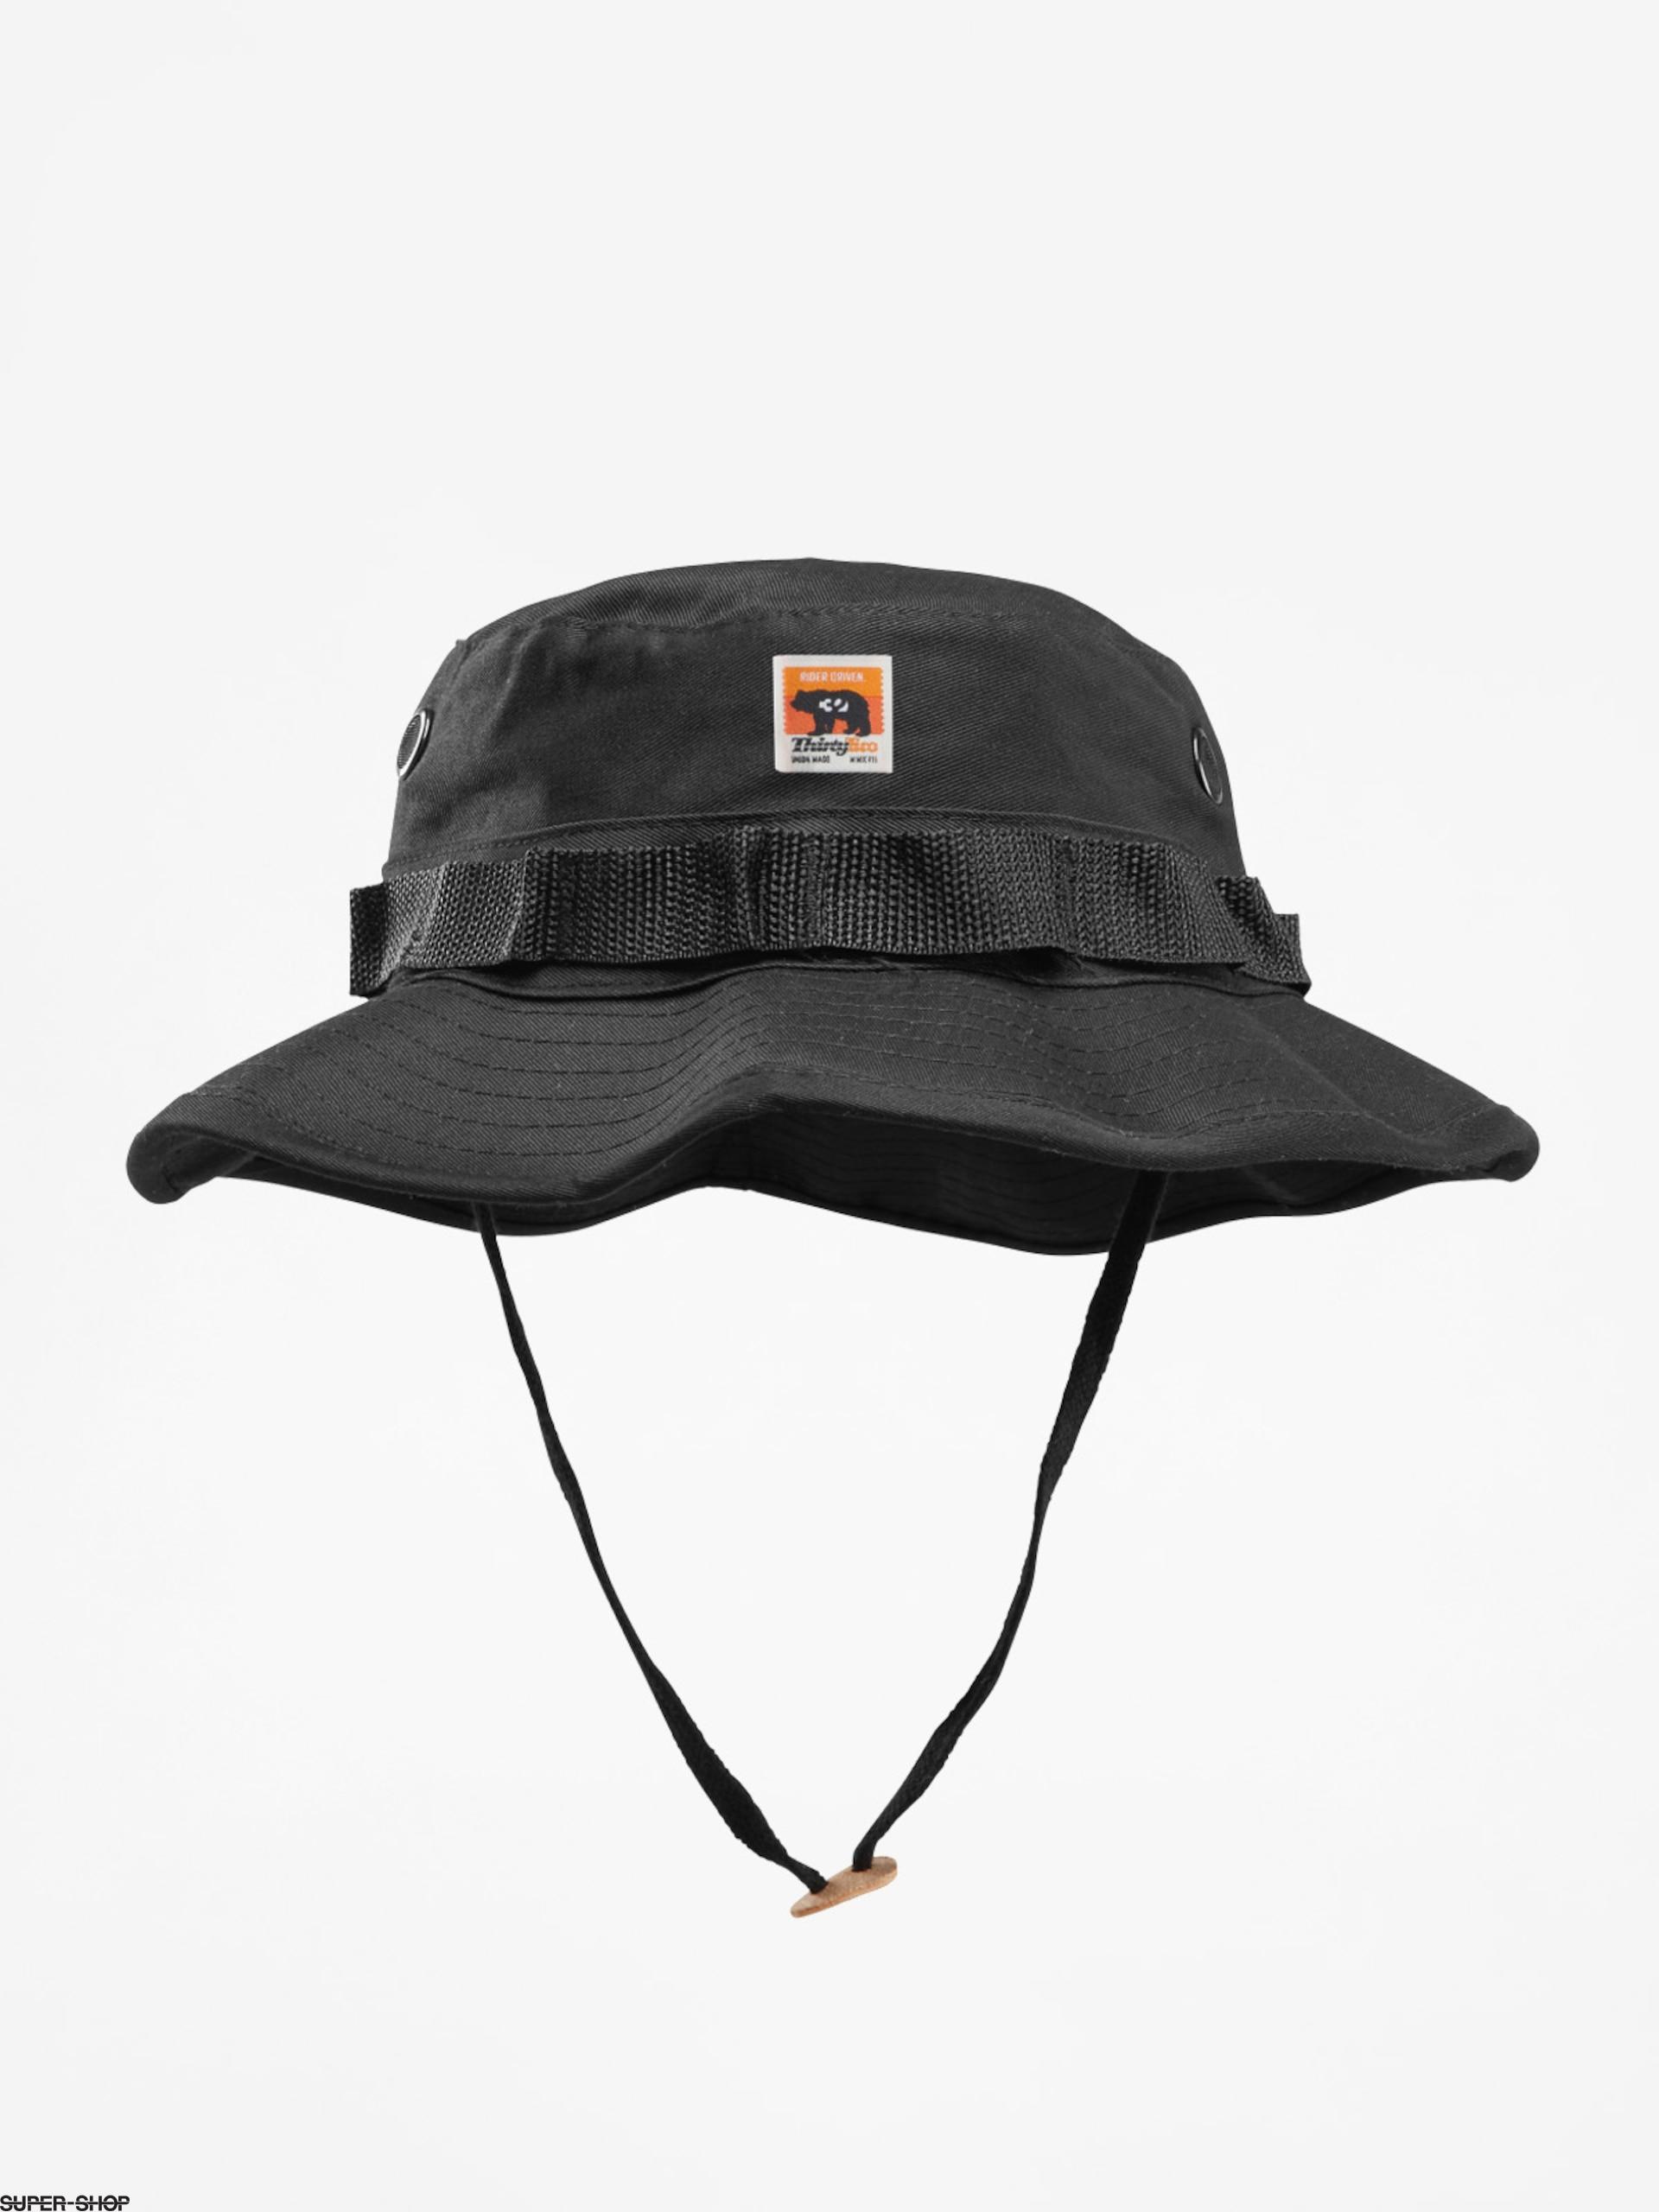 1df0b99532e 896688-w1920-hat-thirtytwo-boonie-black.jpg